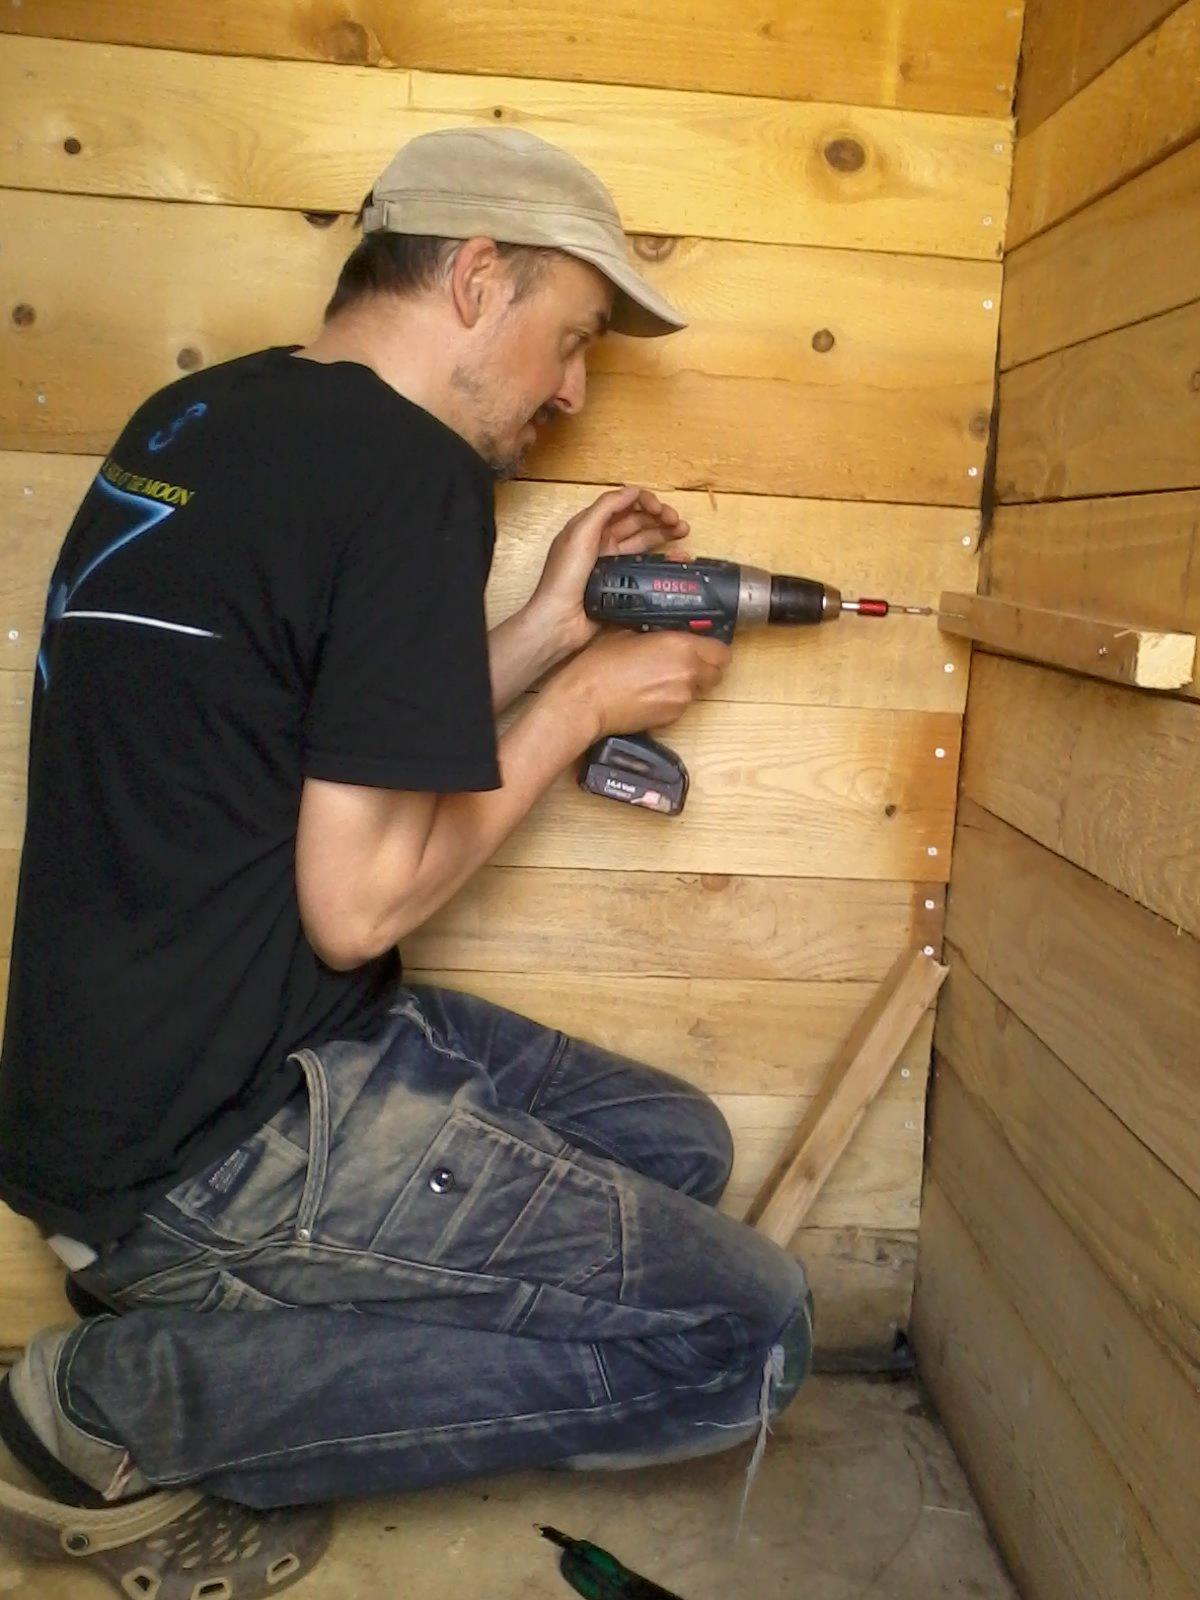 Guy drilling